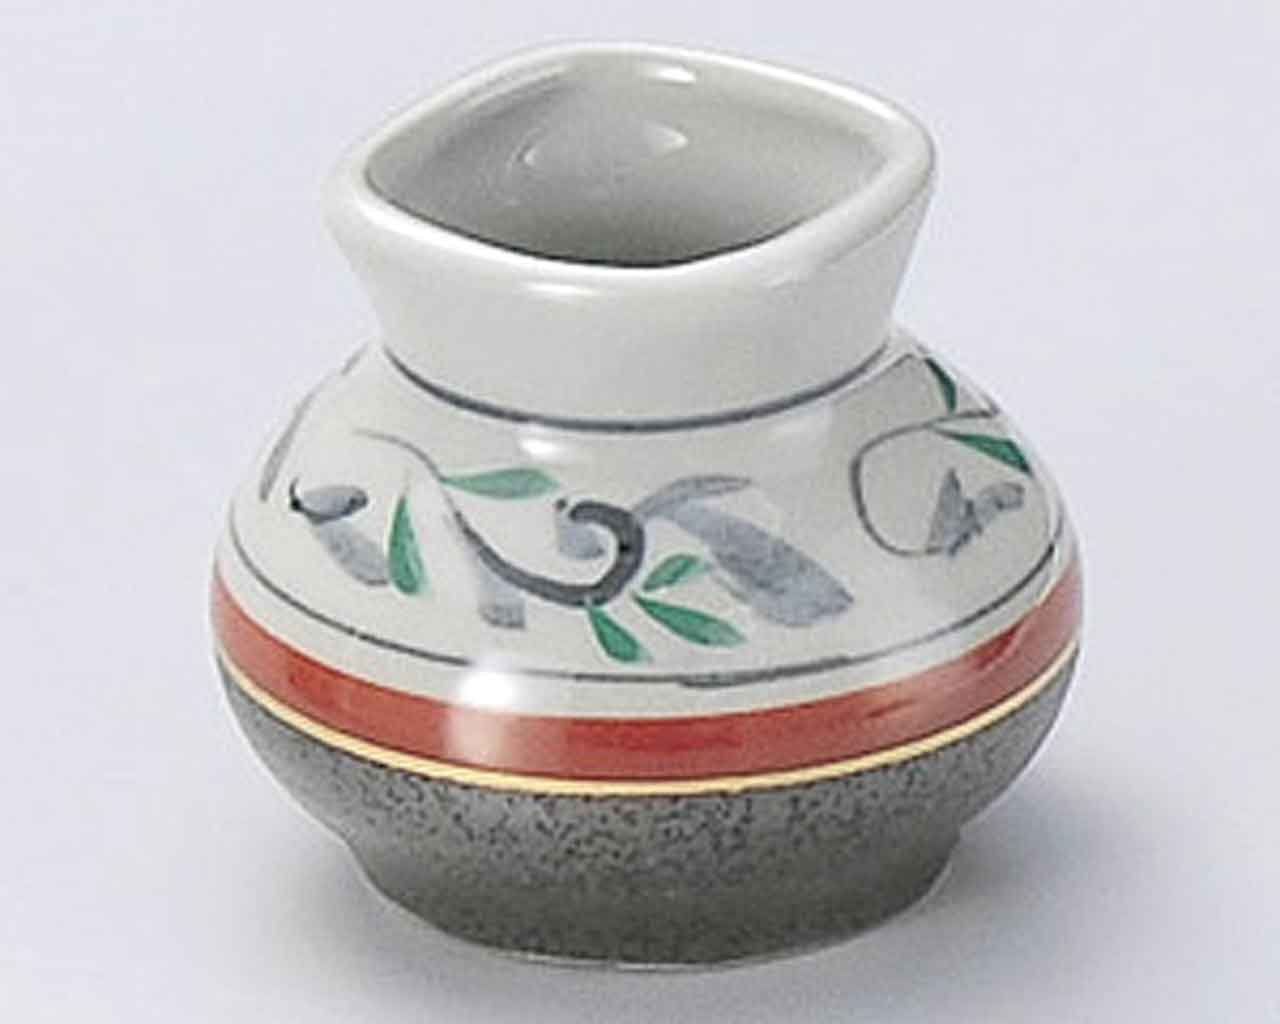 Tessa Karakusa 2.6inch Set of 5 Toothpick holders Grey Ceramic Made in Japan